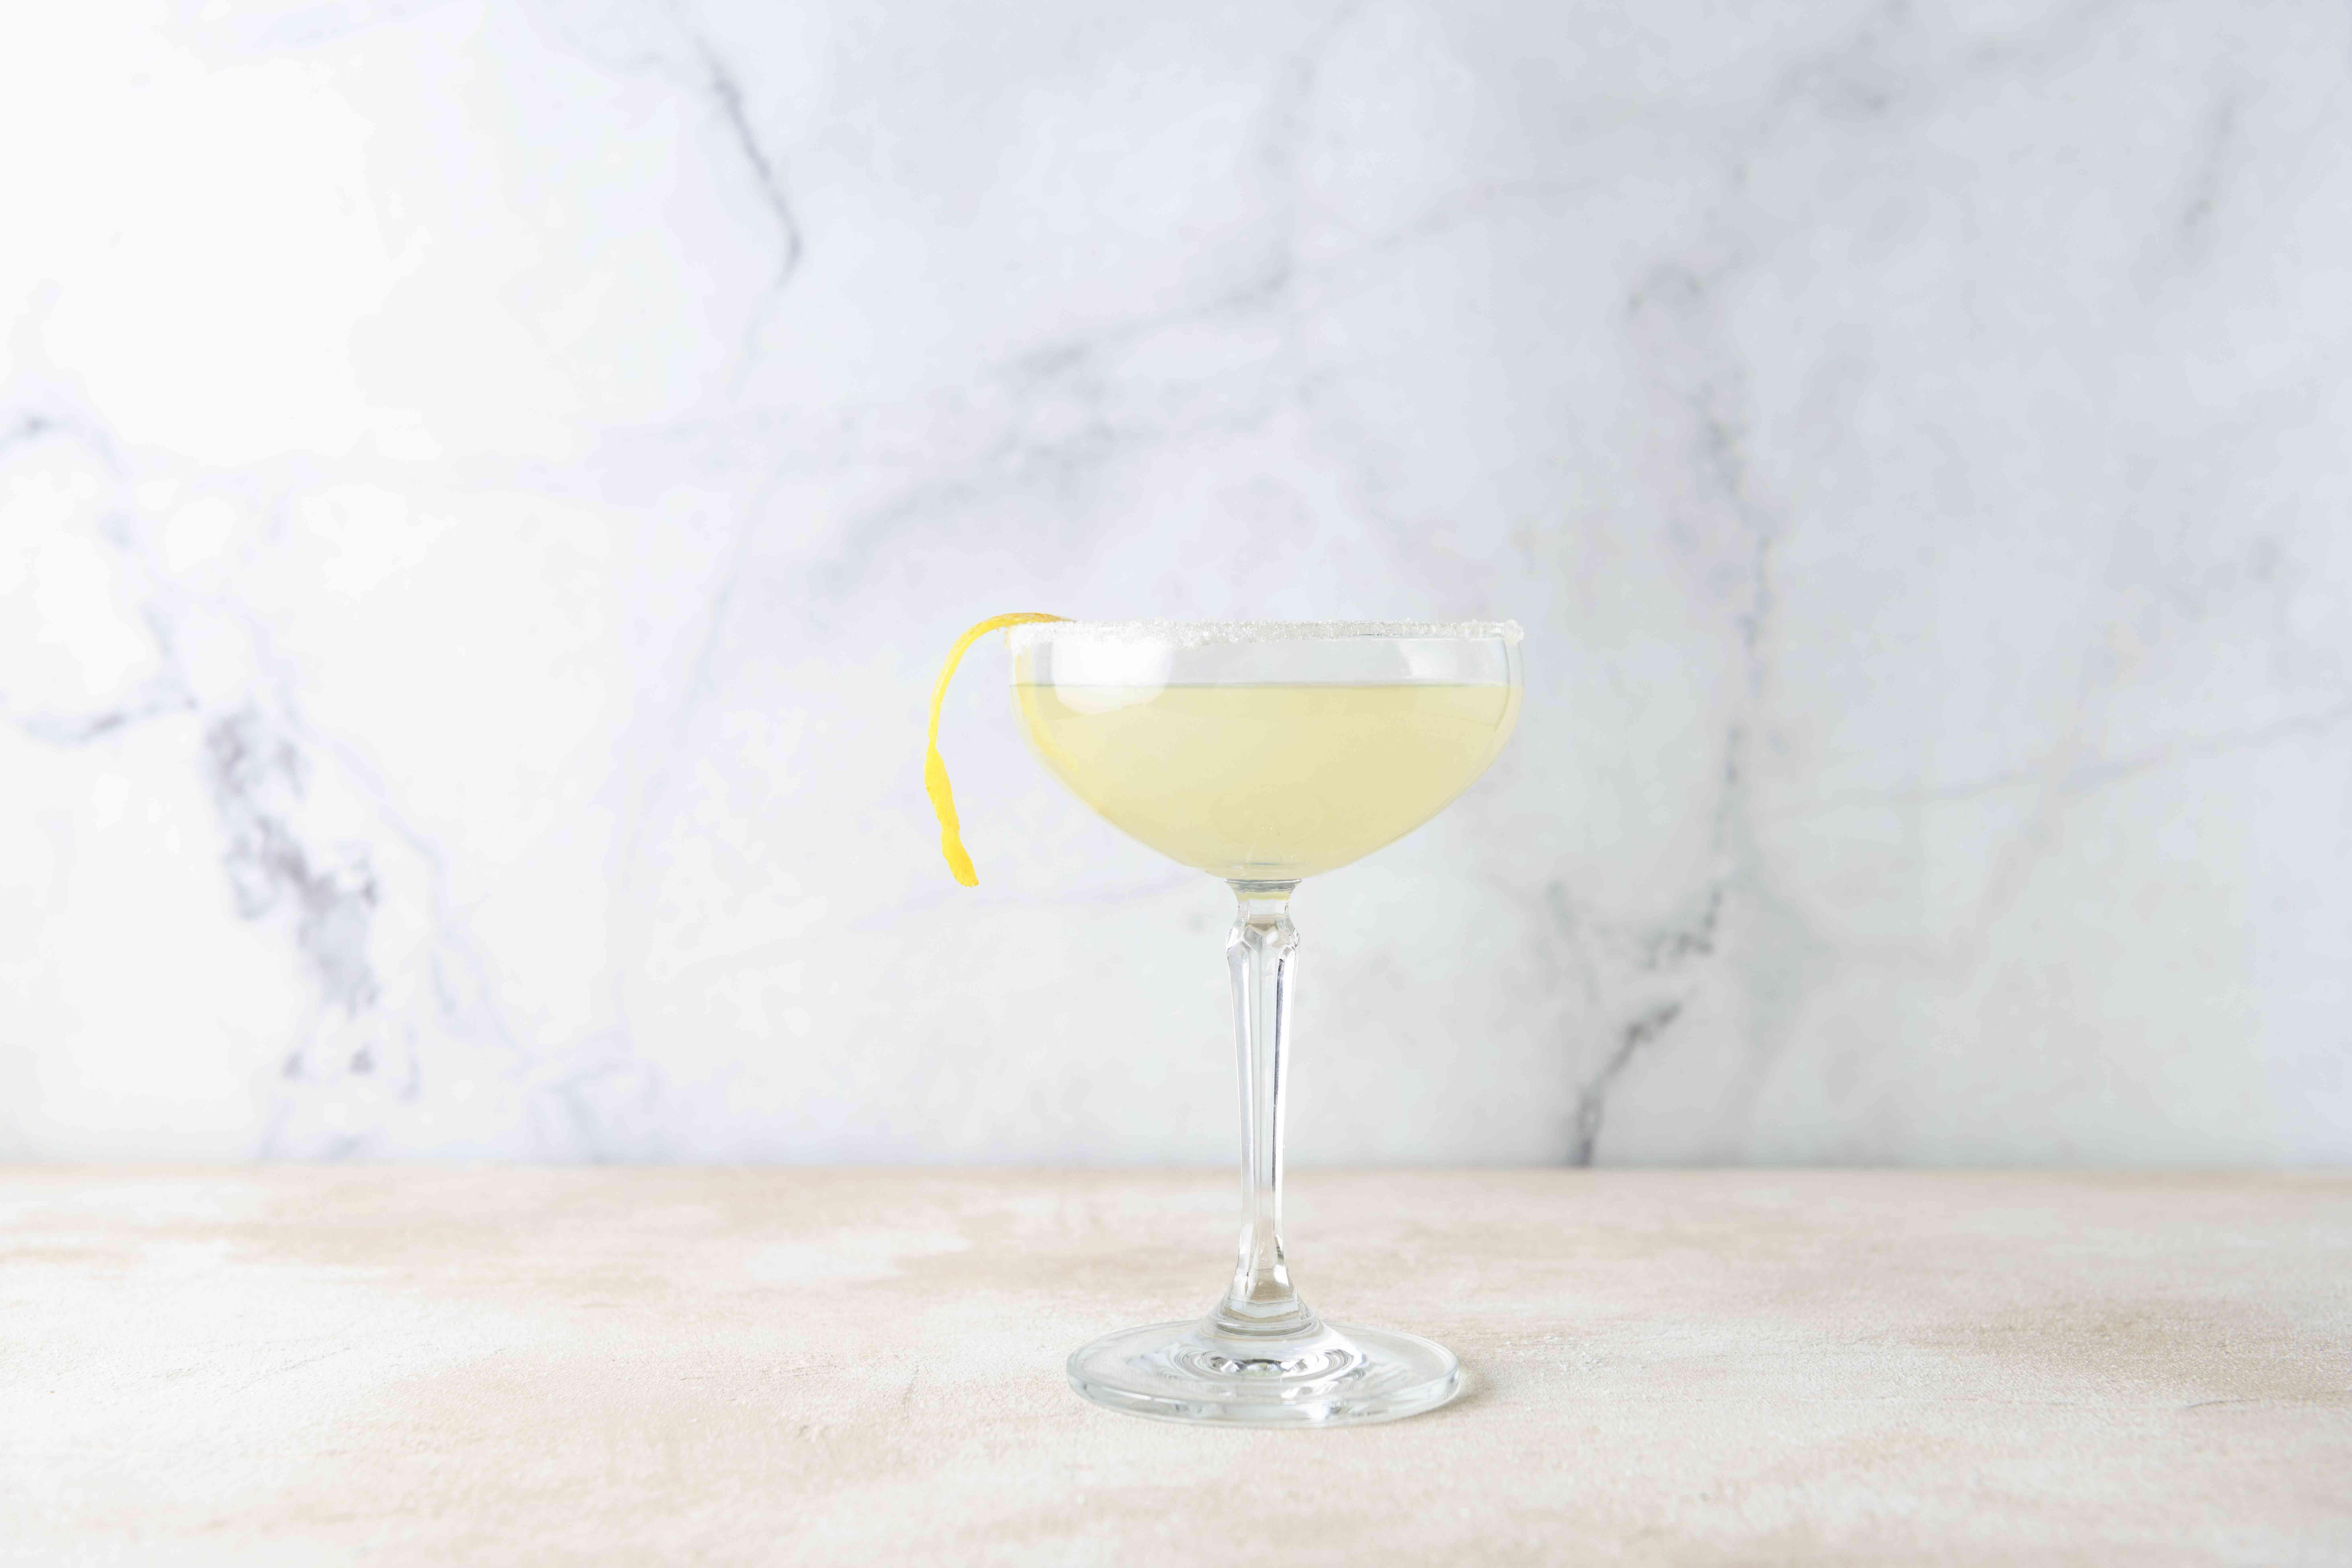 Lemon Drop Martini, garnished with a lemon twist